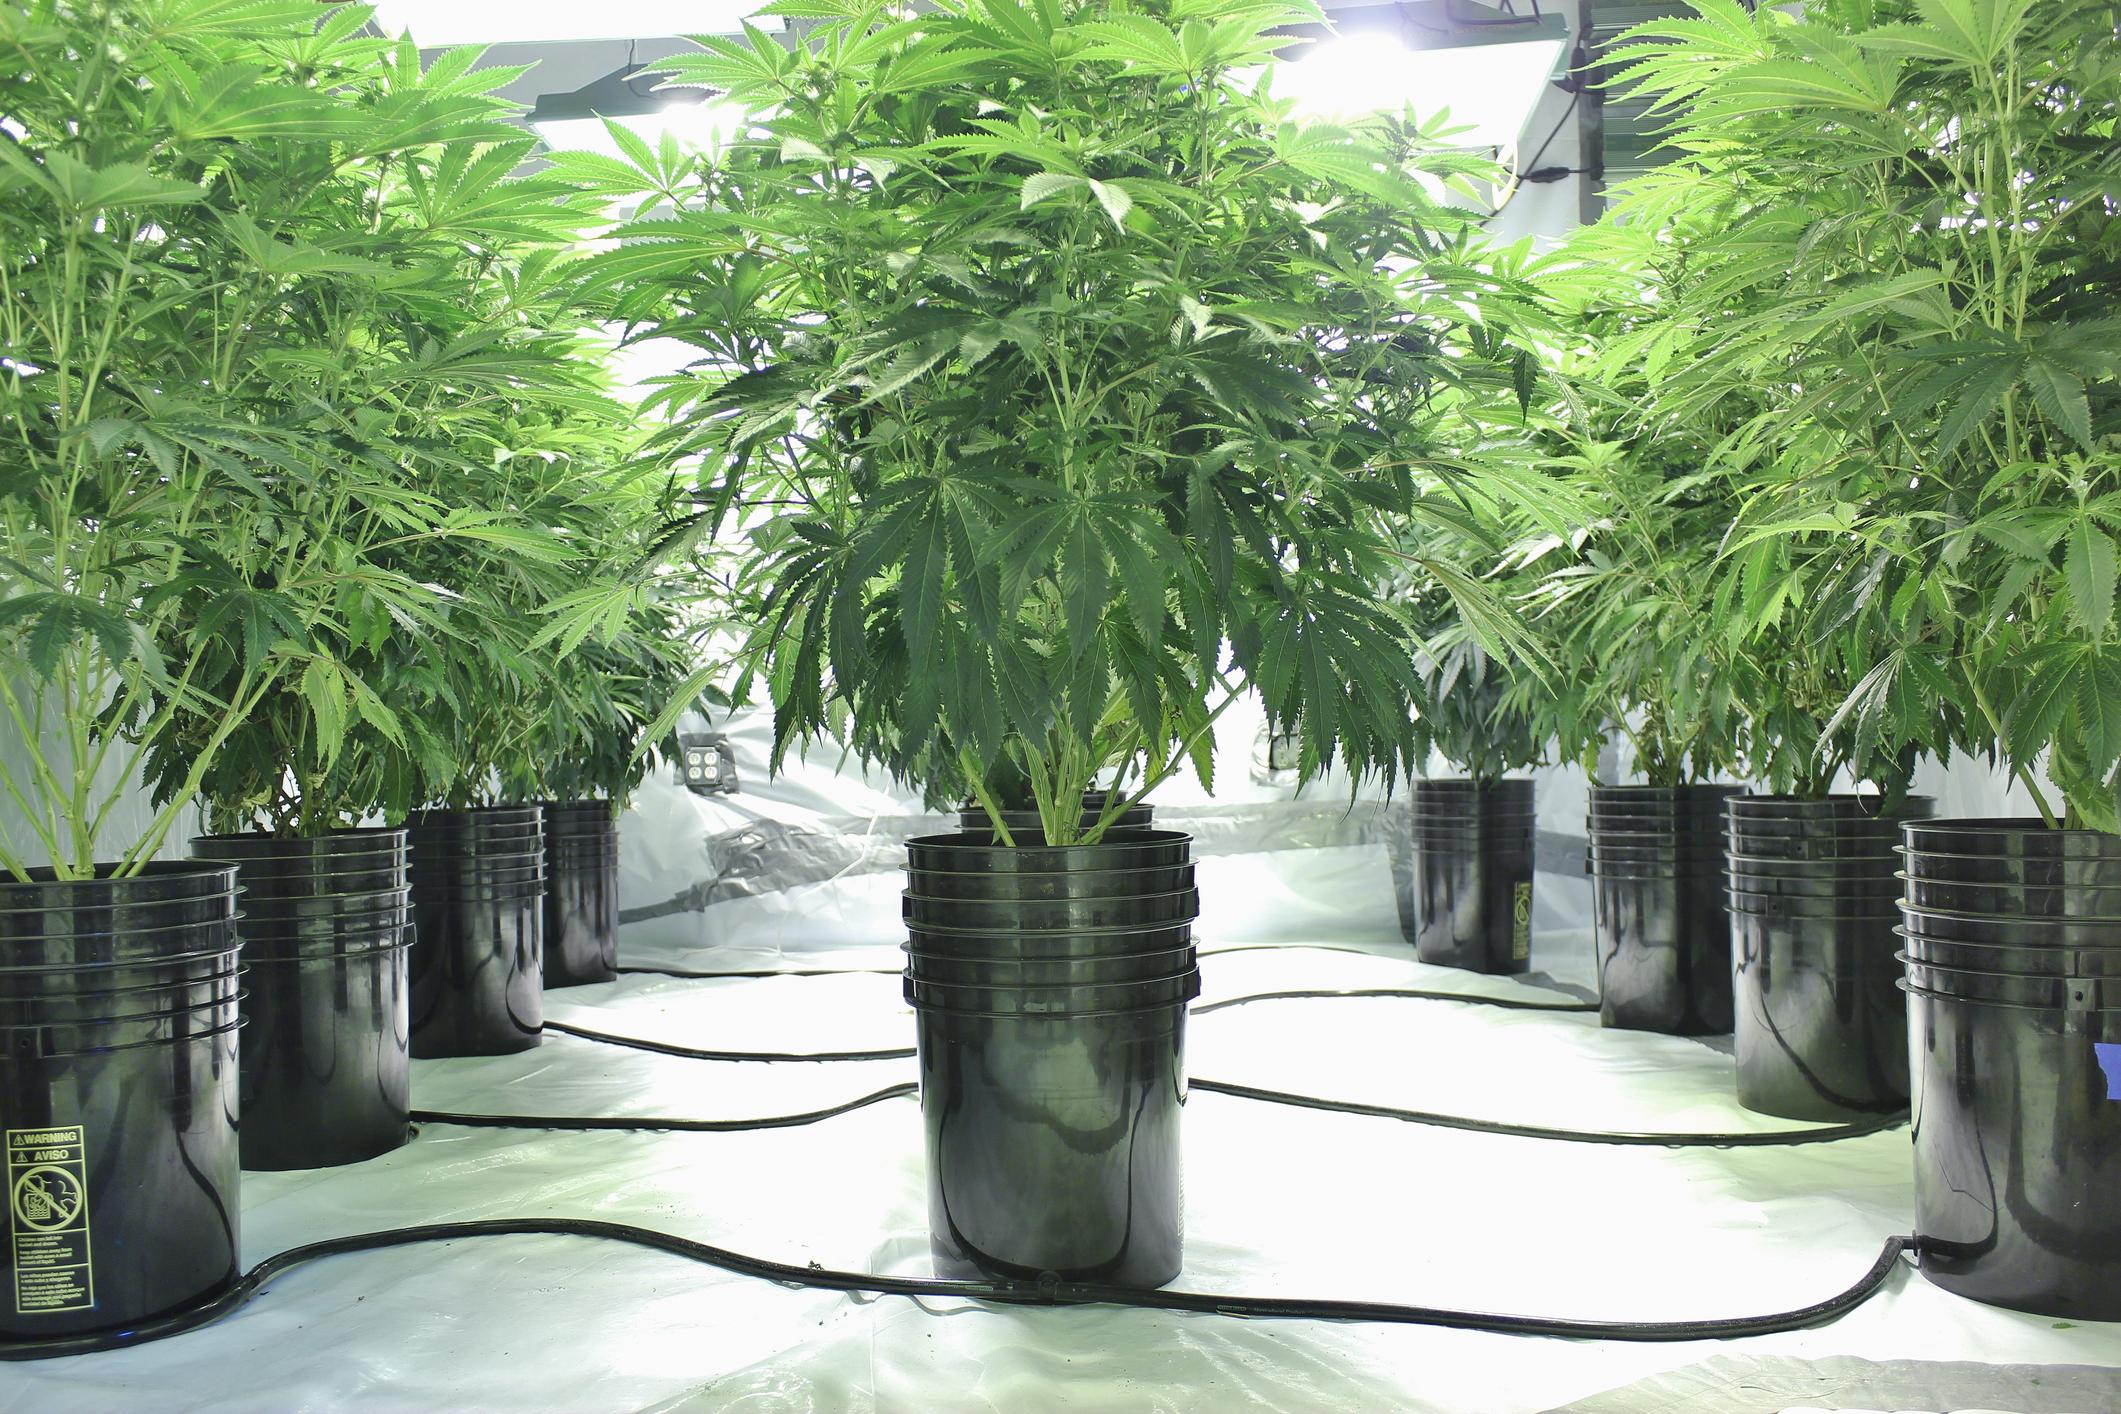 An indoor hydroponic cannabis farm .